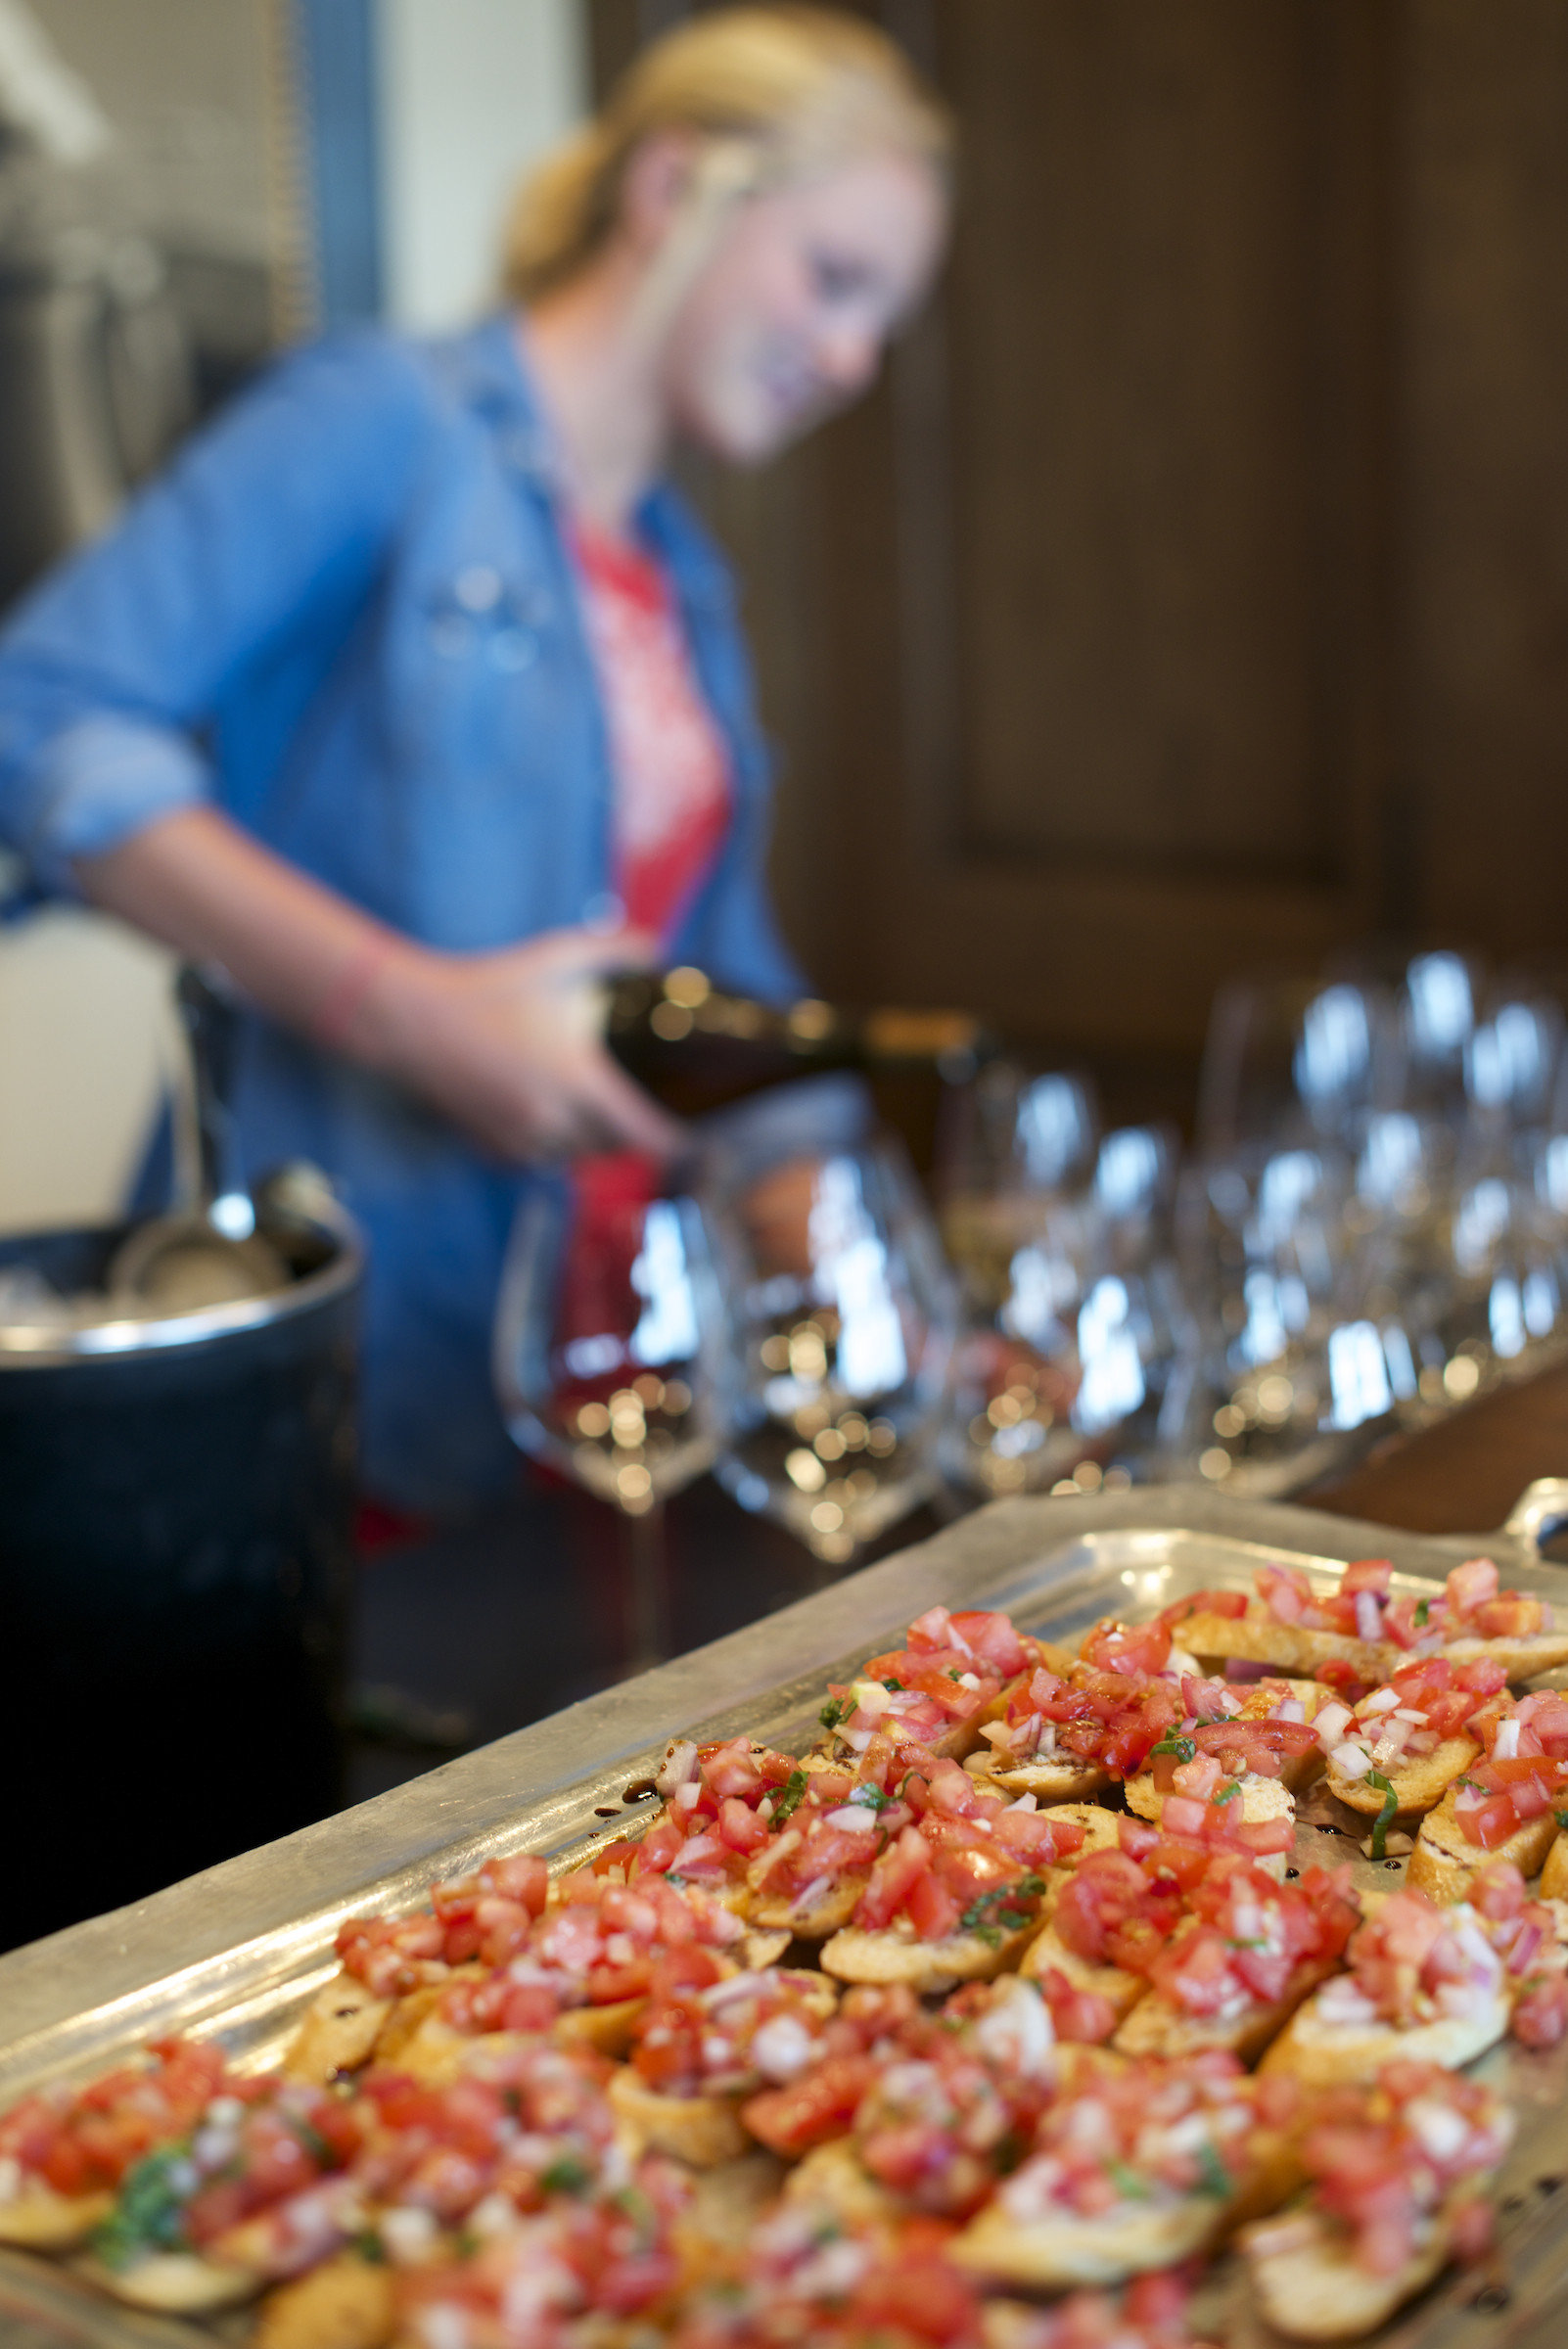 Hotels person indoor food dish meal cuisine brunch breakfast sense baking pizza